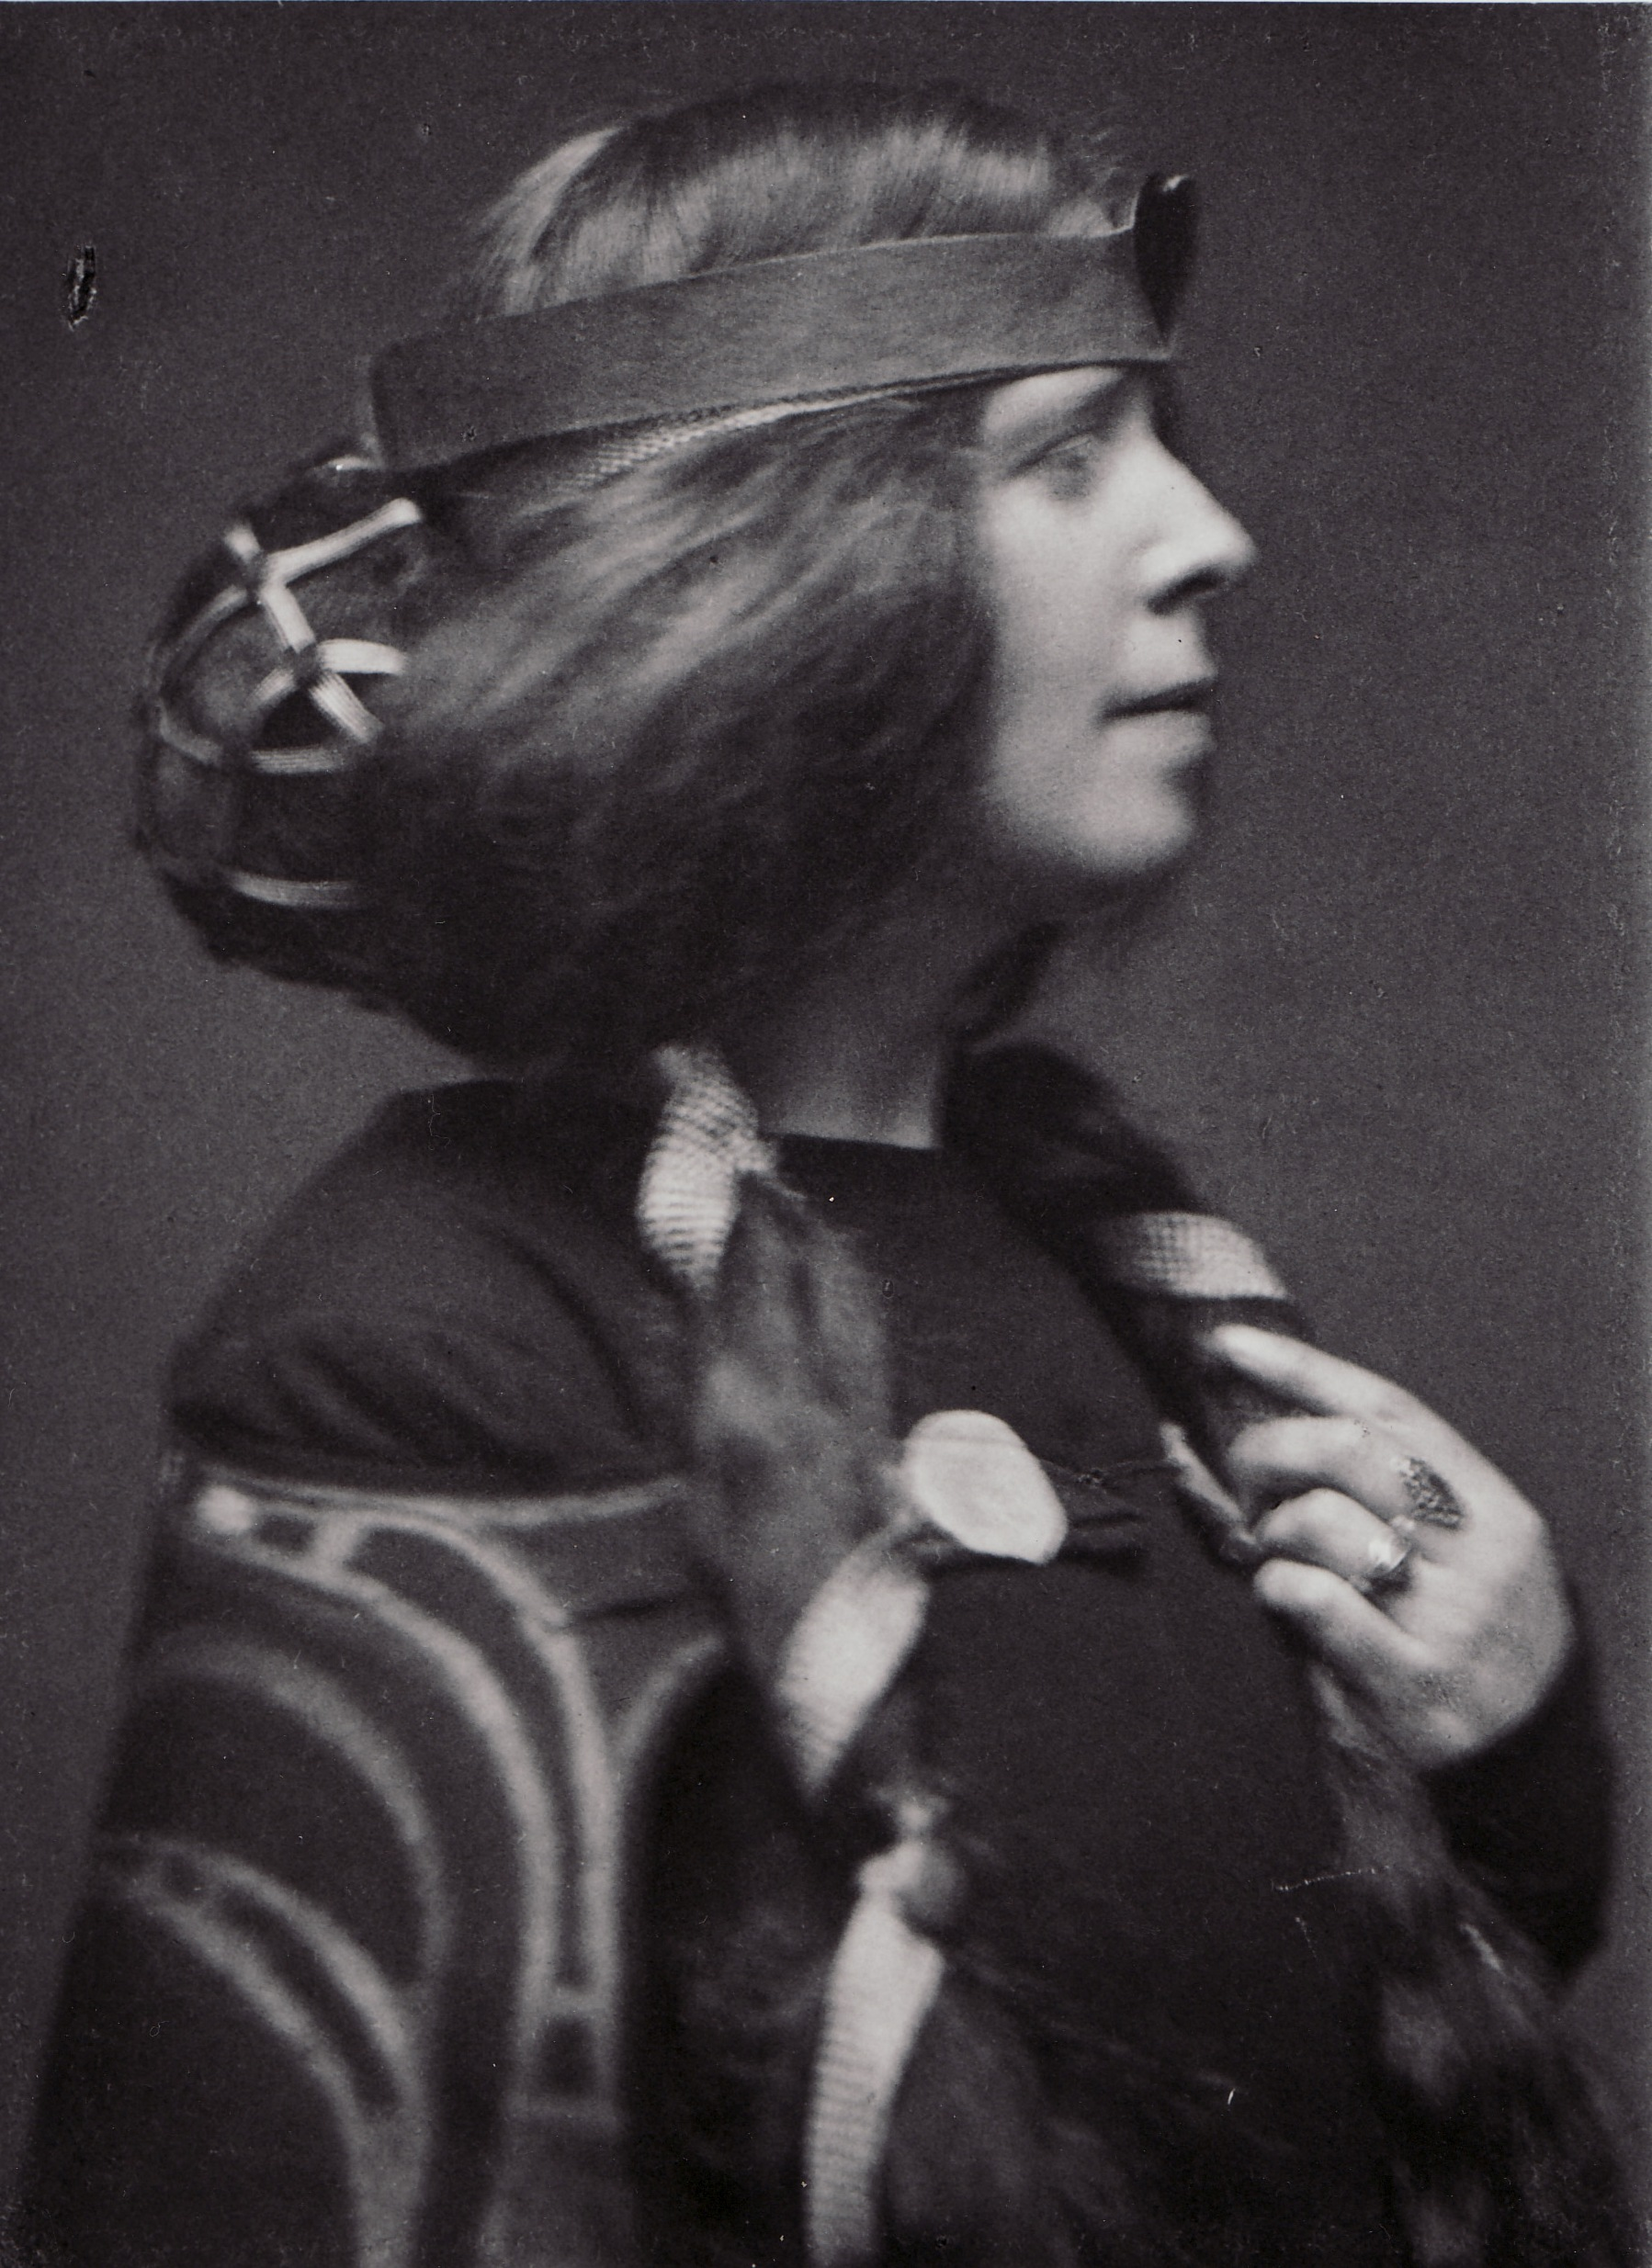 Margaret Macdonald Mackintosh, wife of Charles Rennie Mackintosh. Image credit: T R Annan & Son